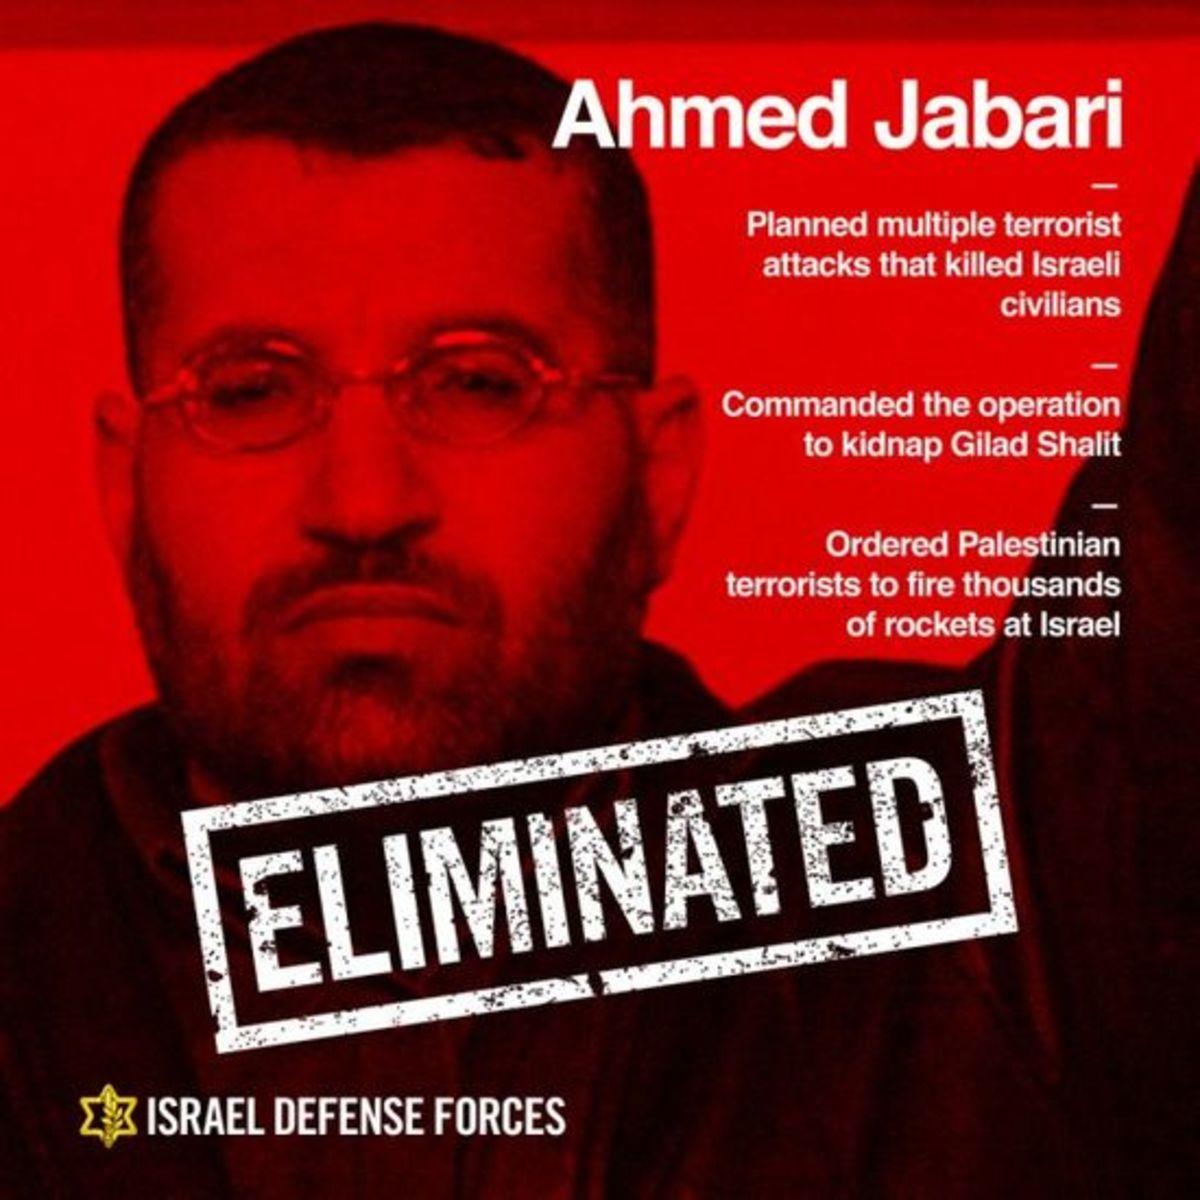 Jabarifb1-640x640